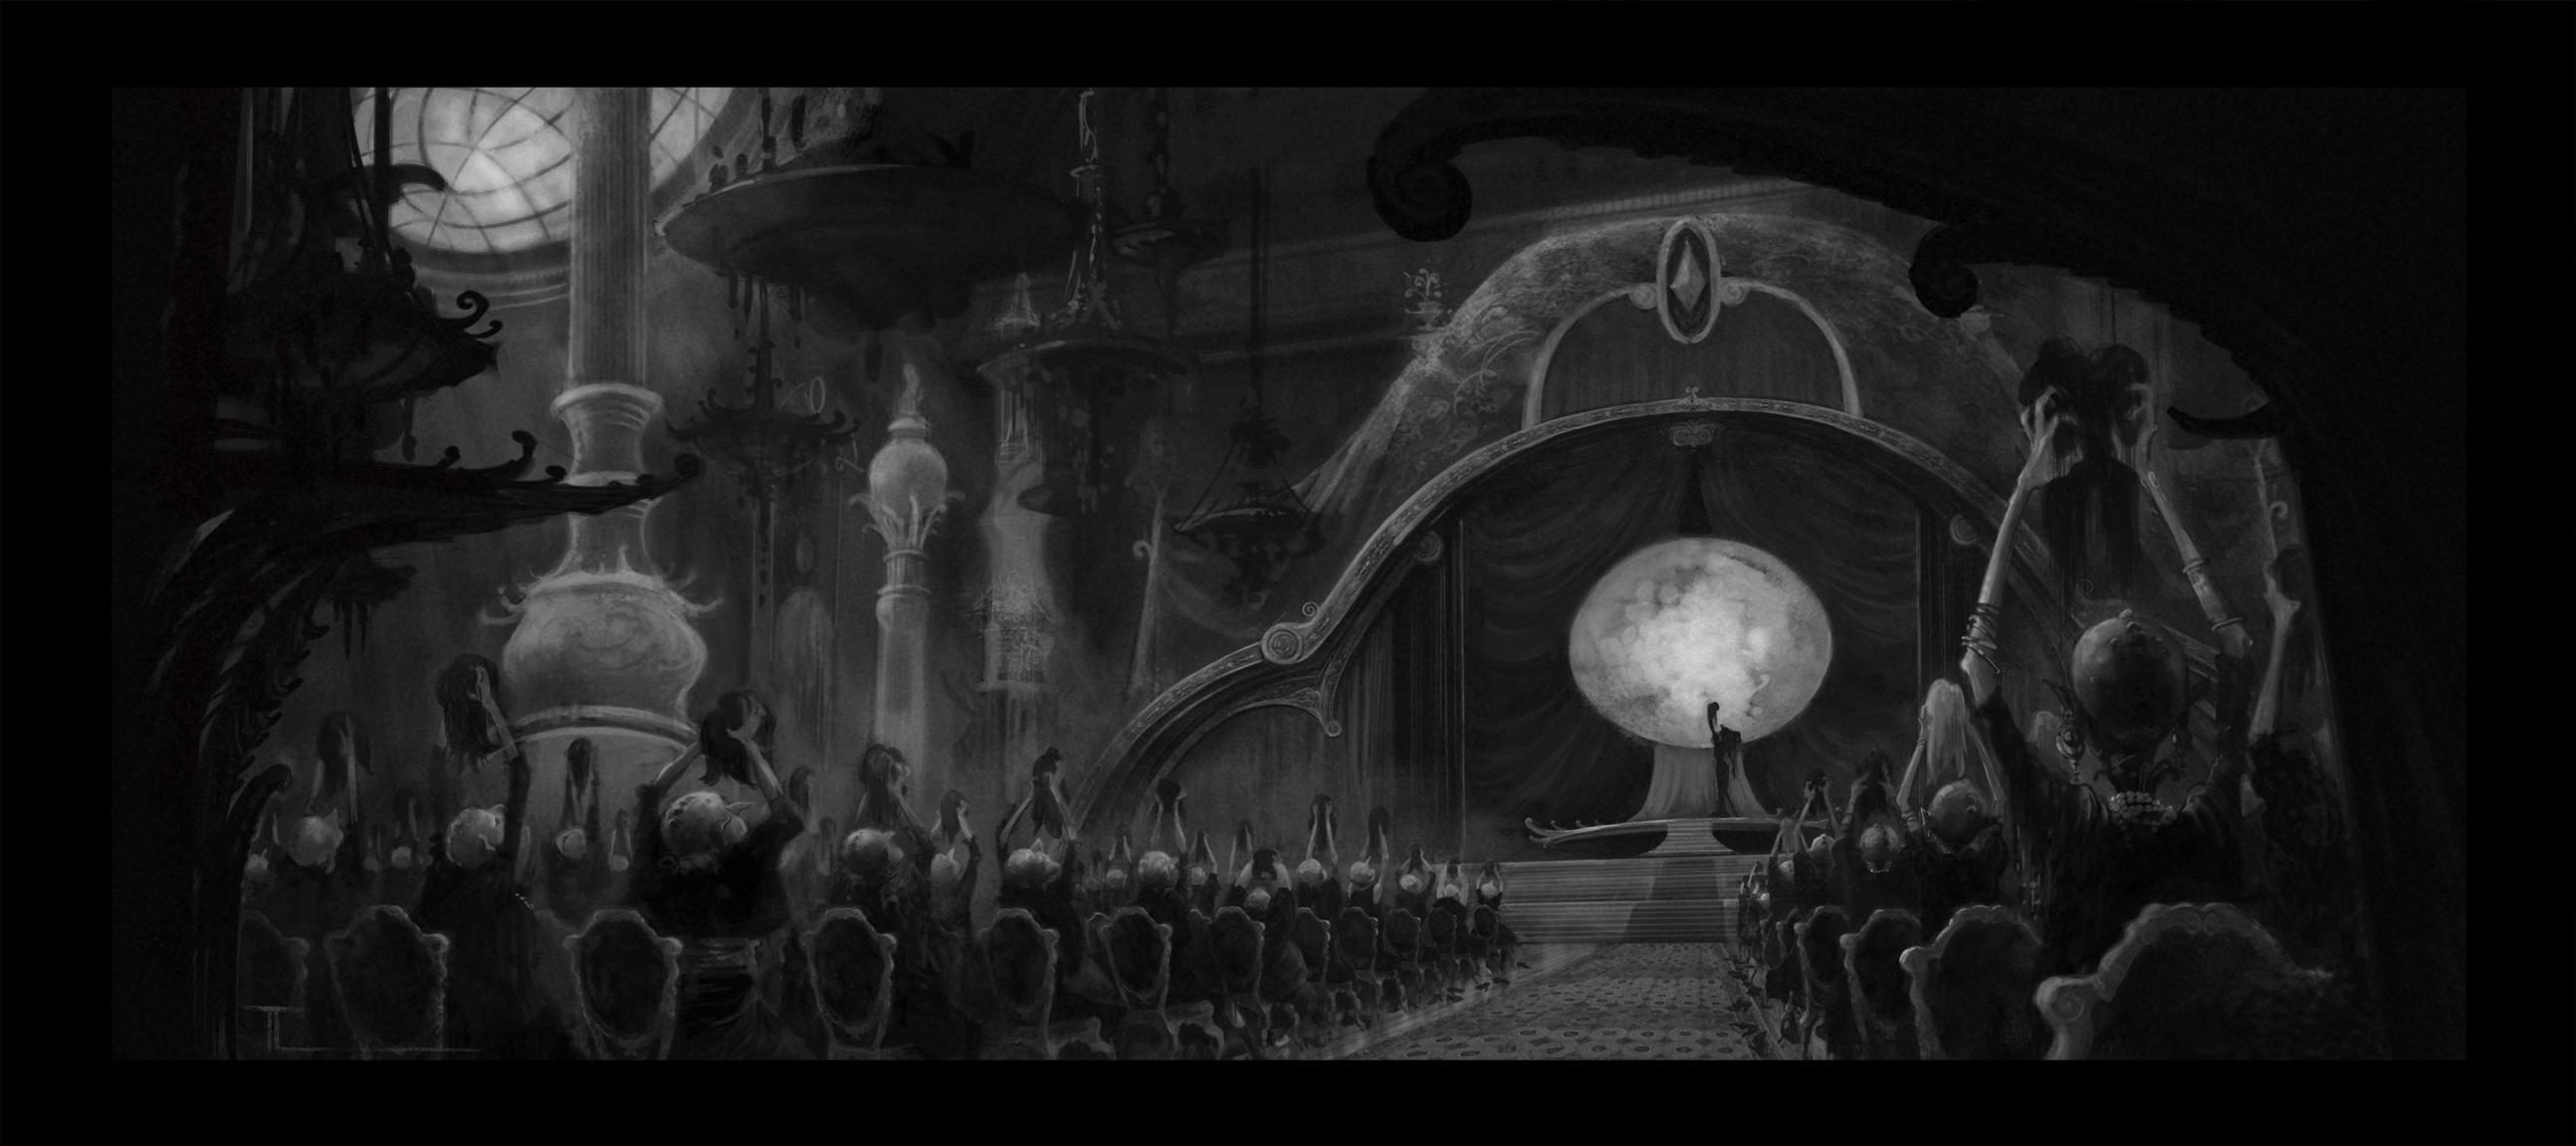 Witches-Ballroom_TonyLovett